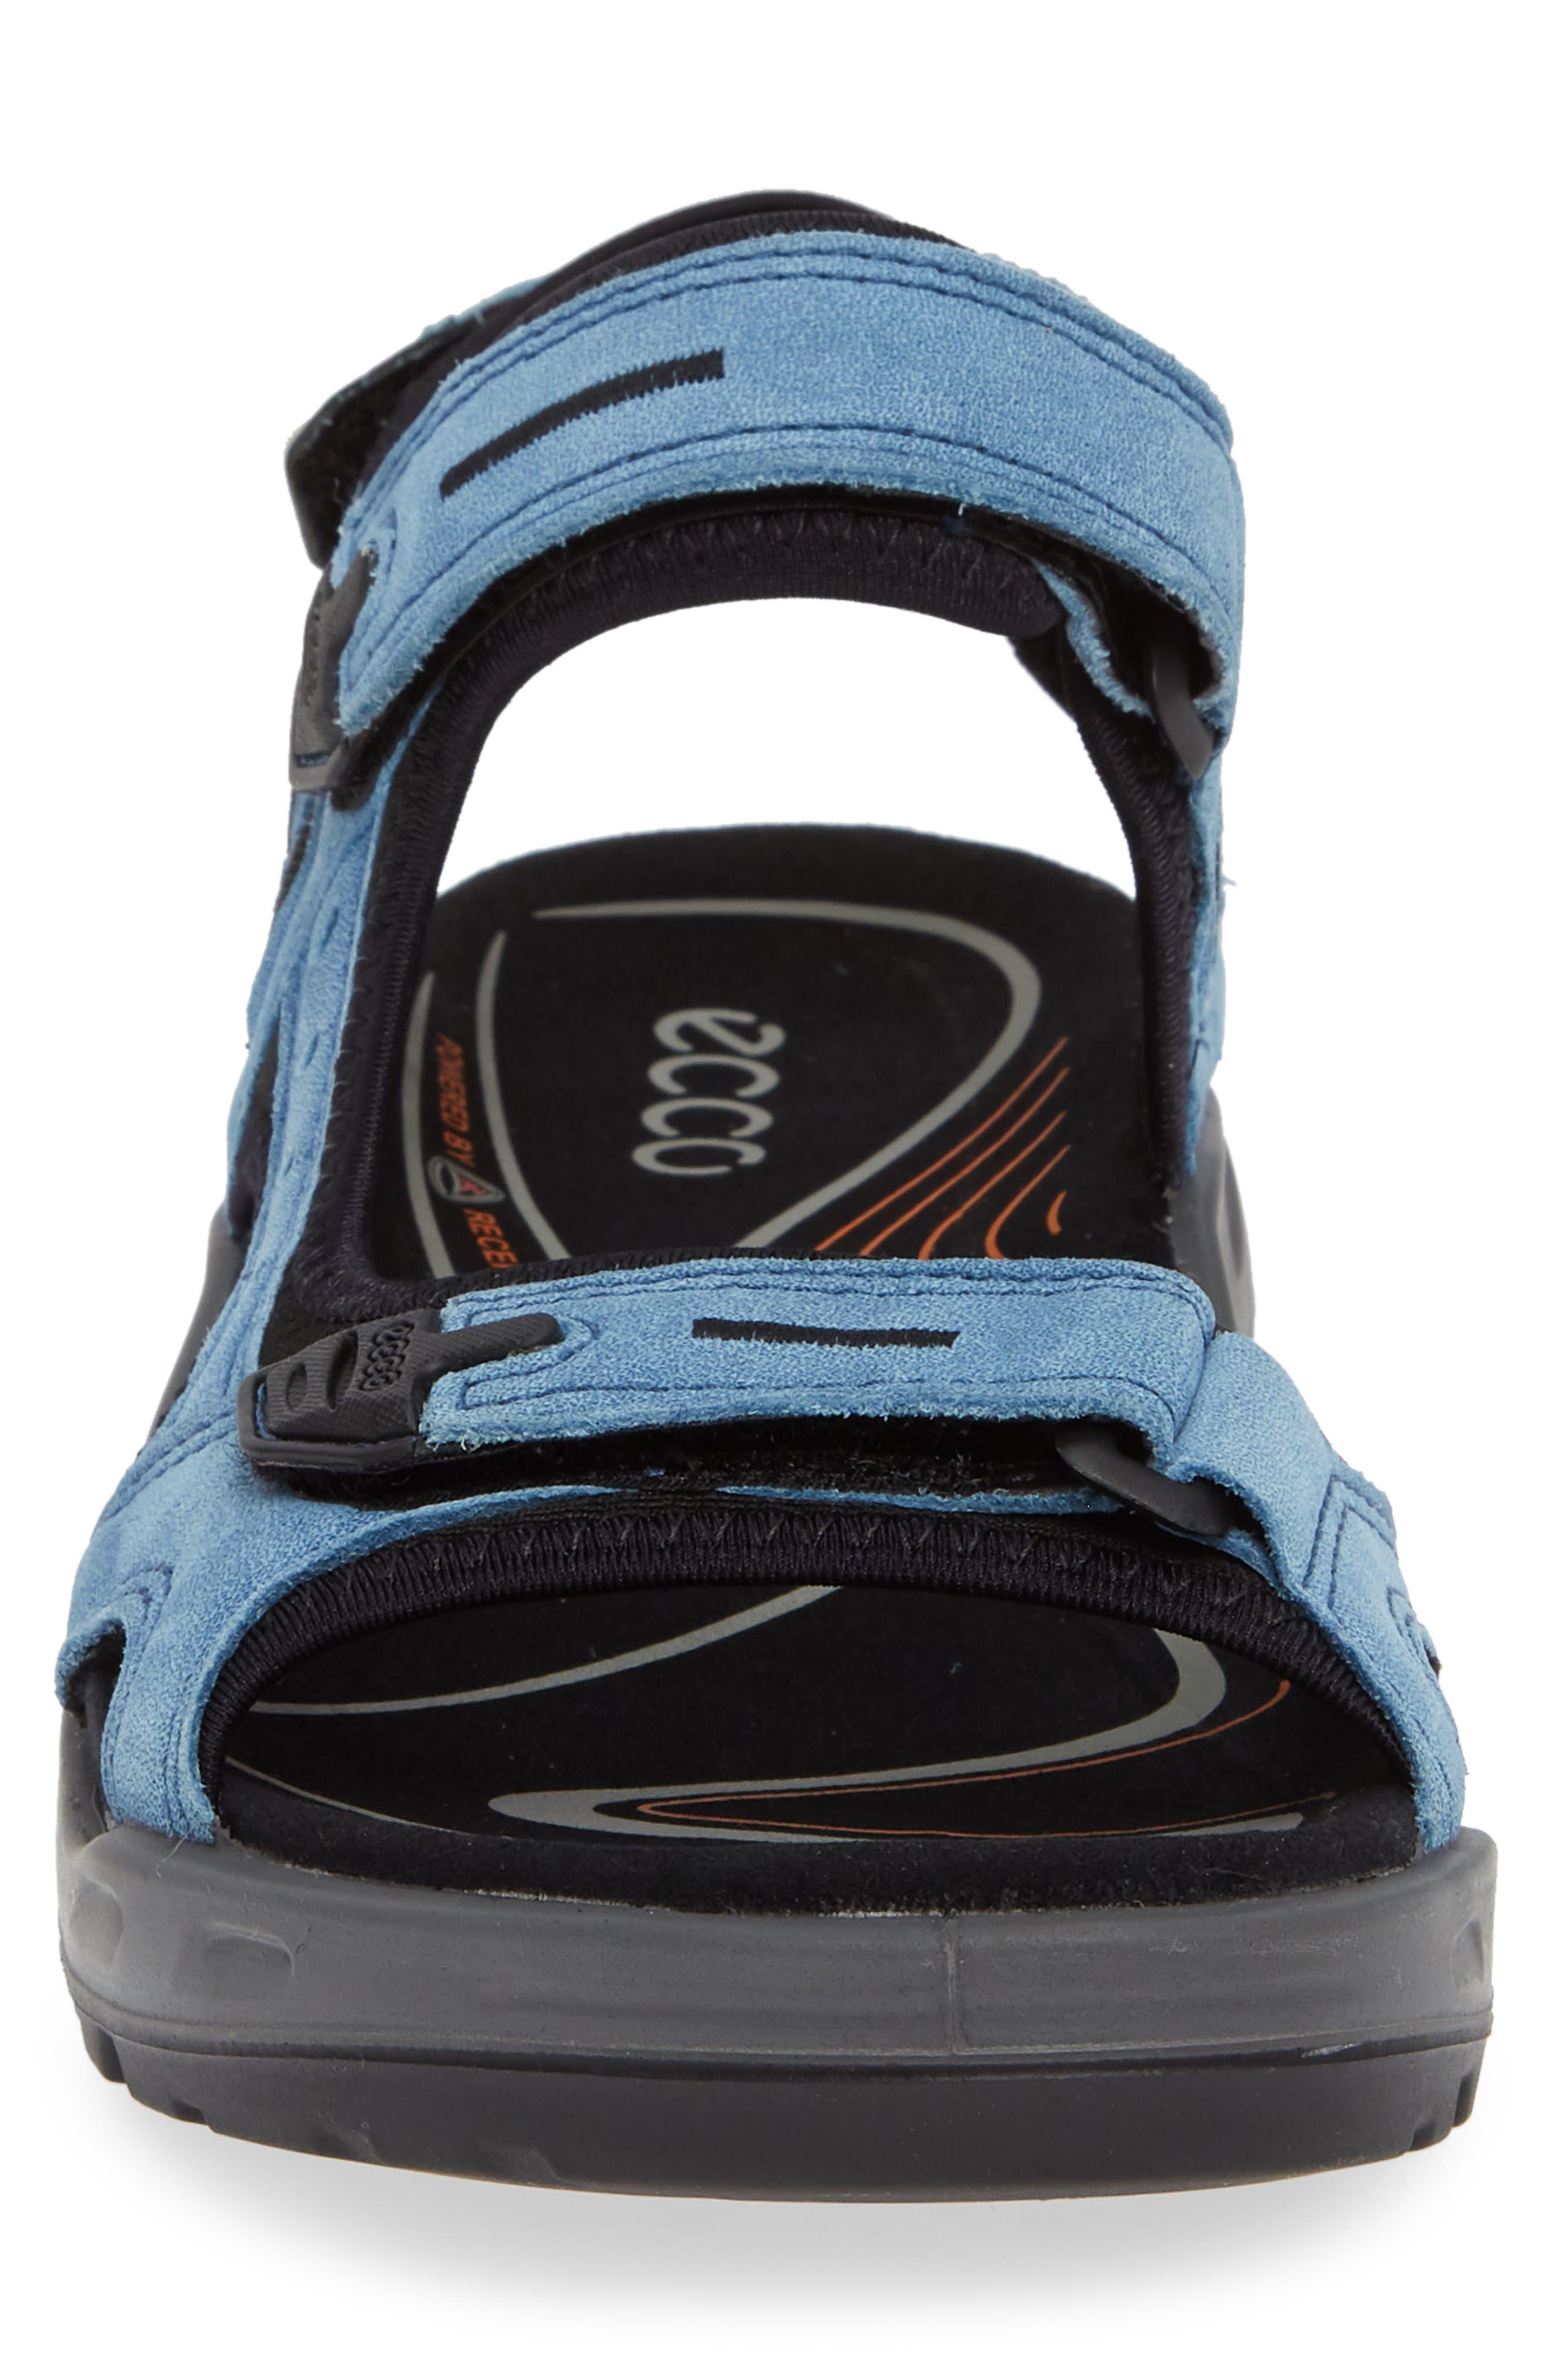 Offroad Sport Sandal,                             Alternate thumbnail 4, color,                             INDIGO LEATHER